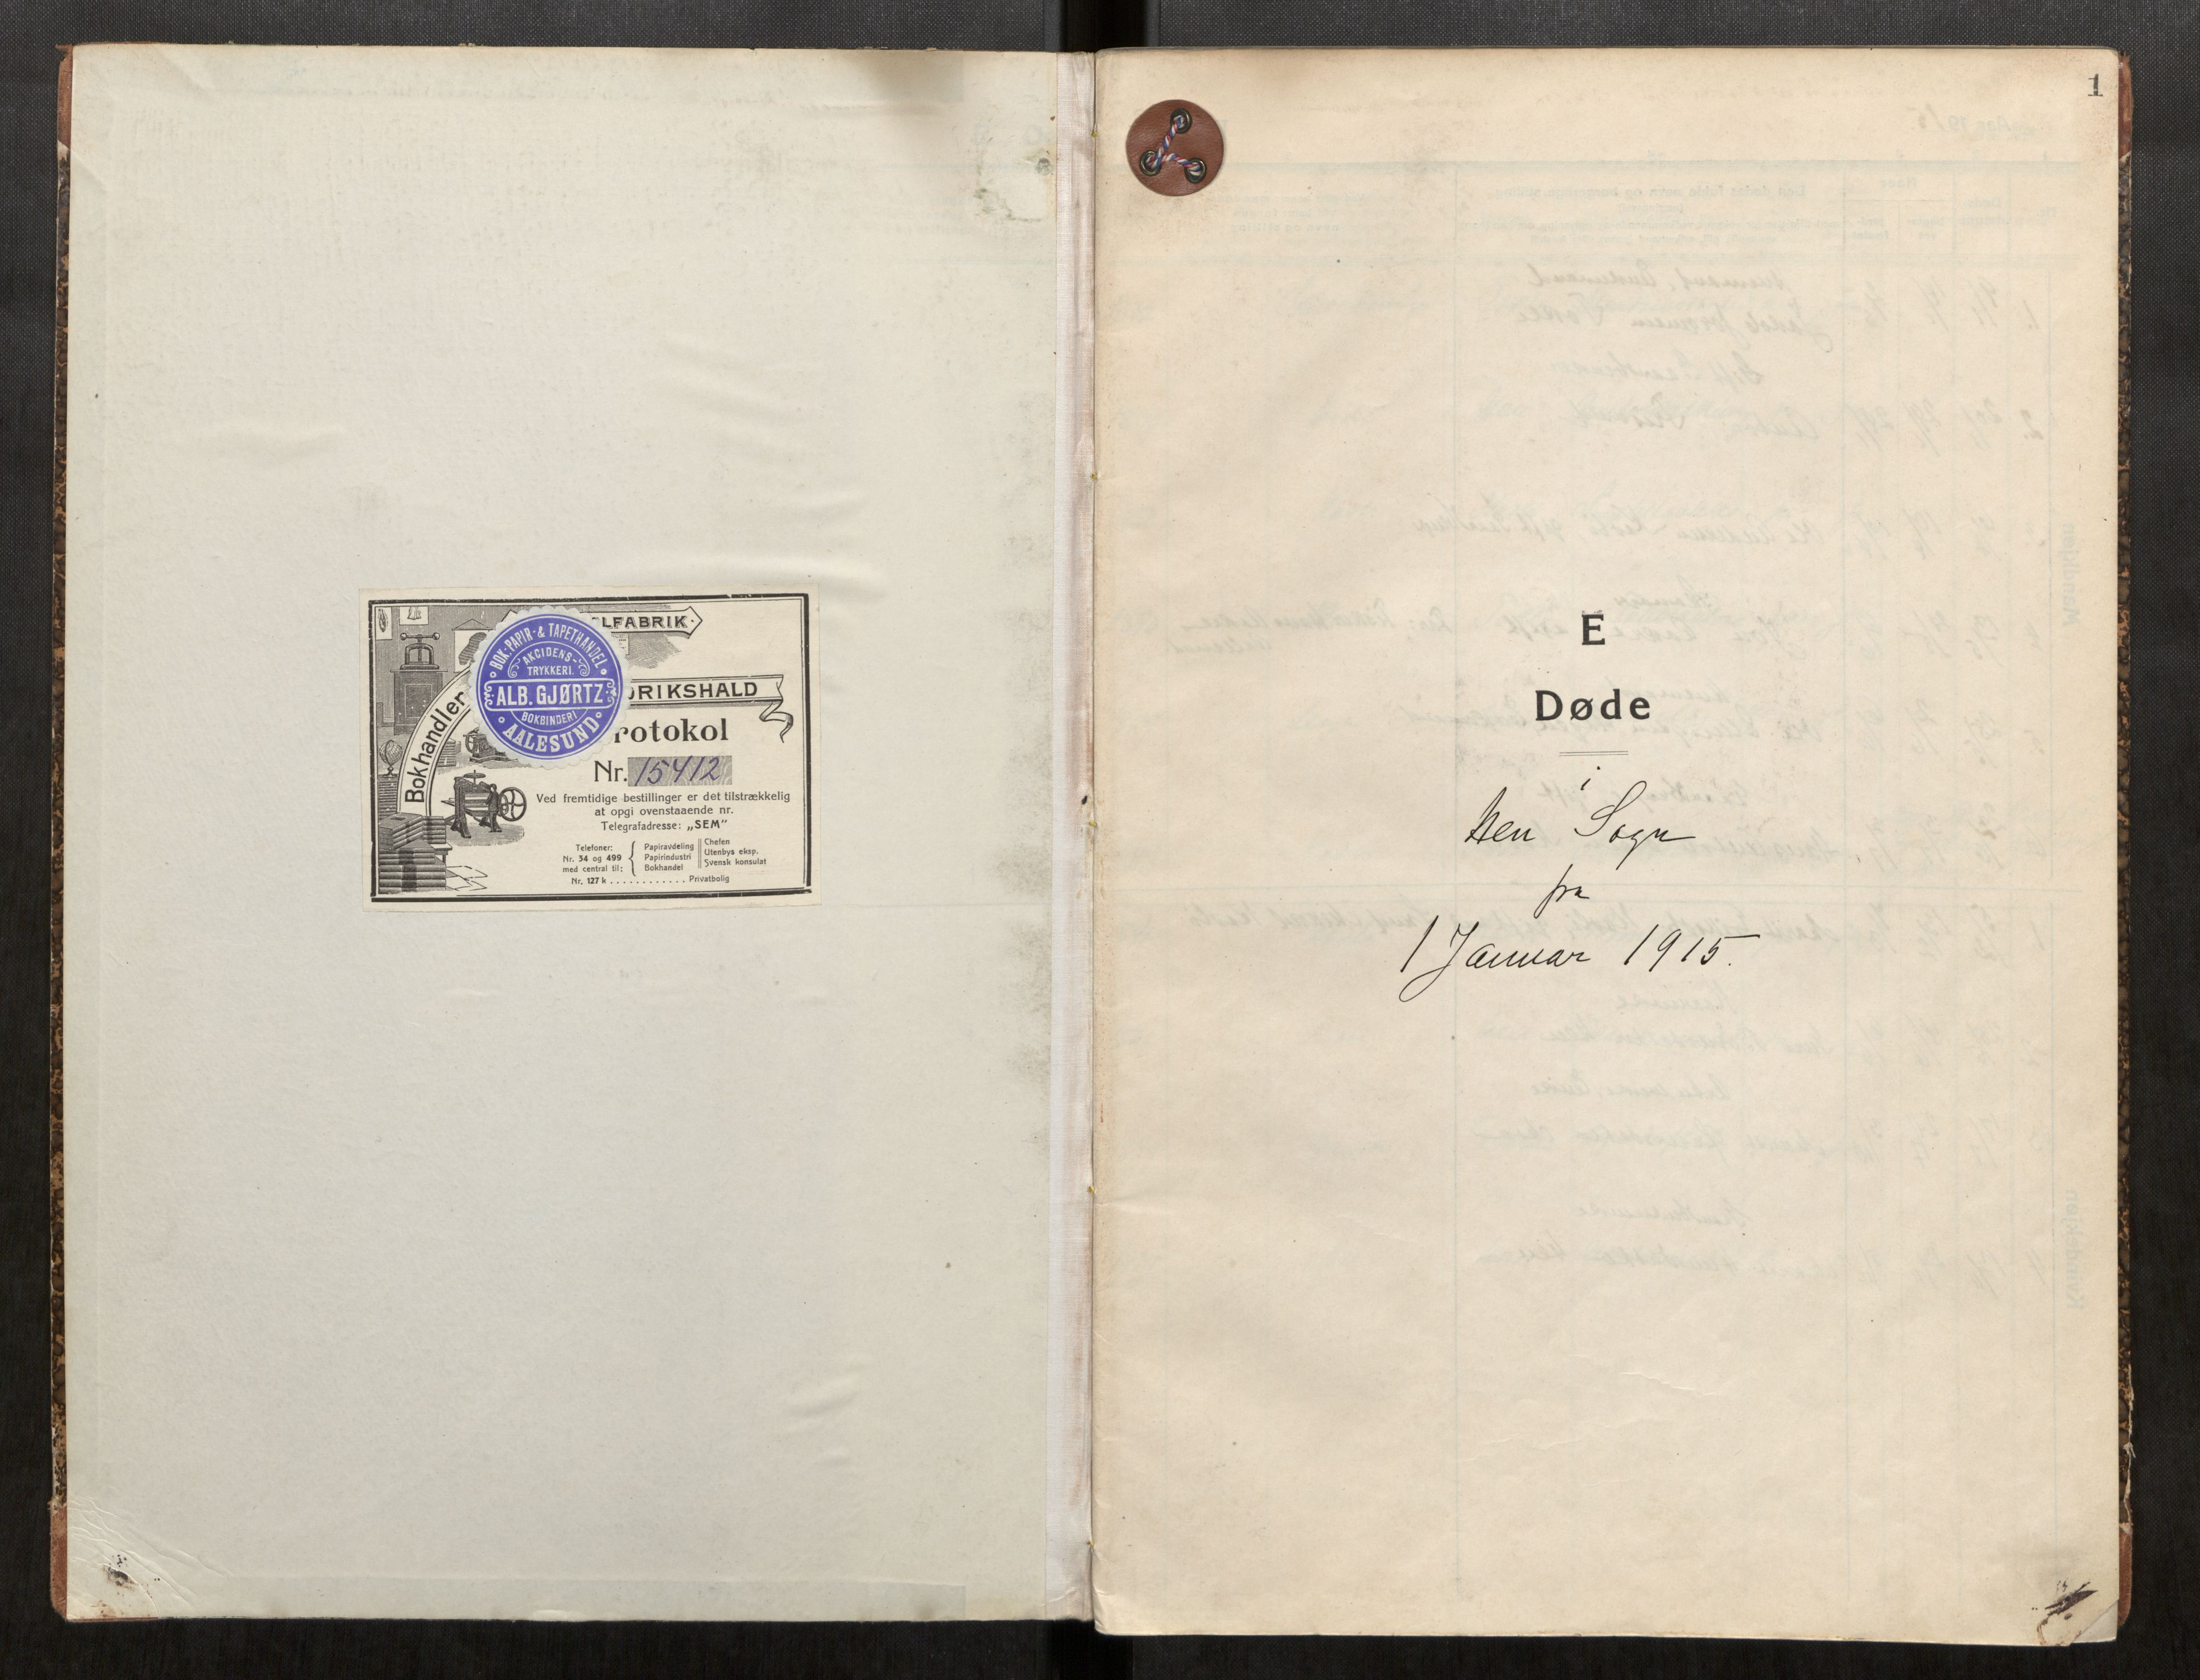 SAT, Grytten sokneprestkontor, Ministerialbok nr. 545A05, 1915-1921, s. 1